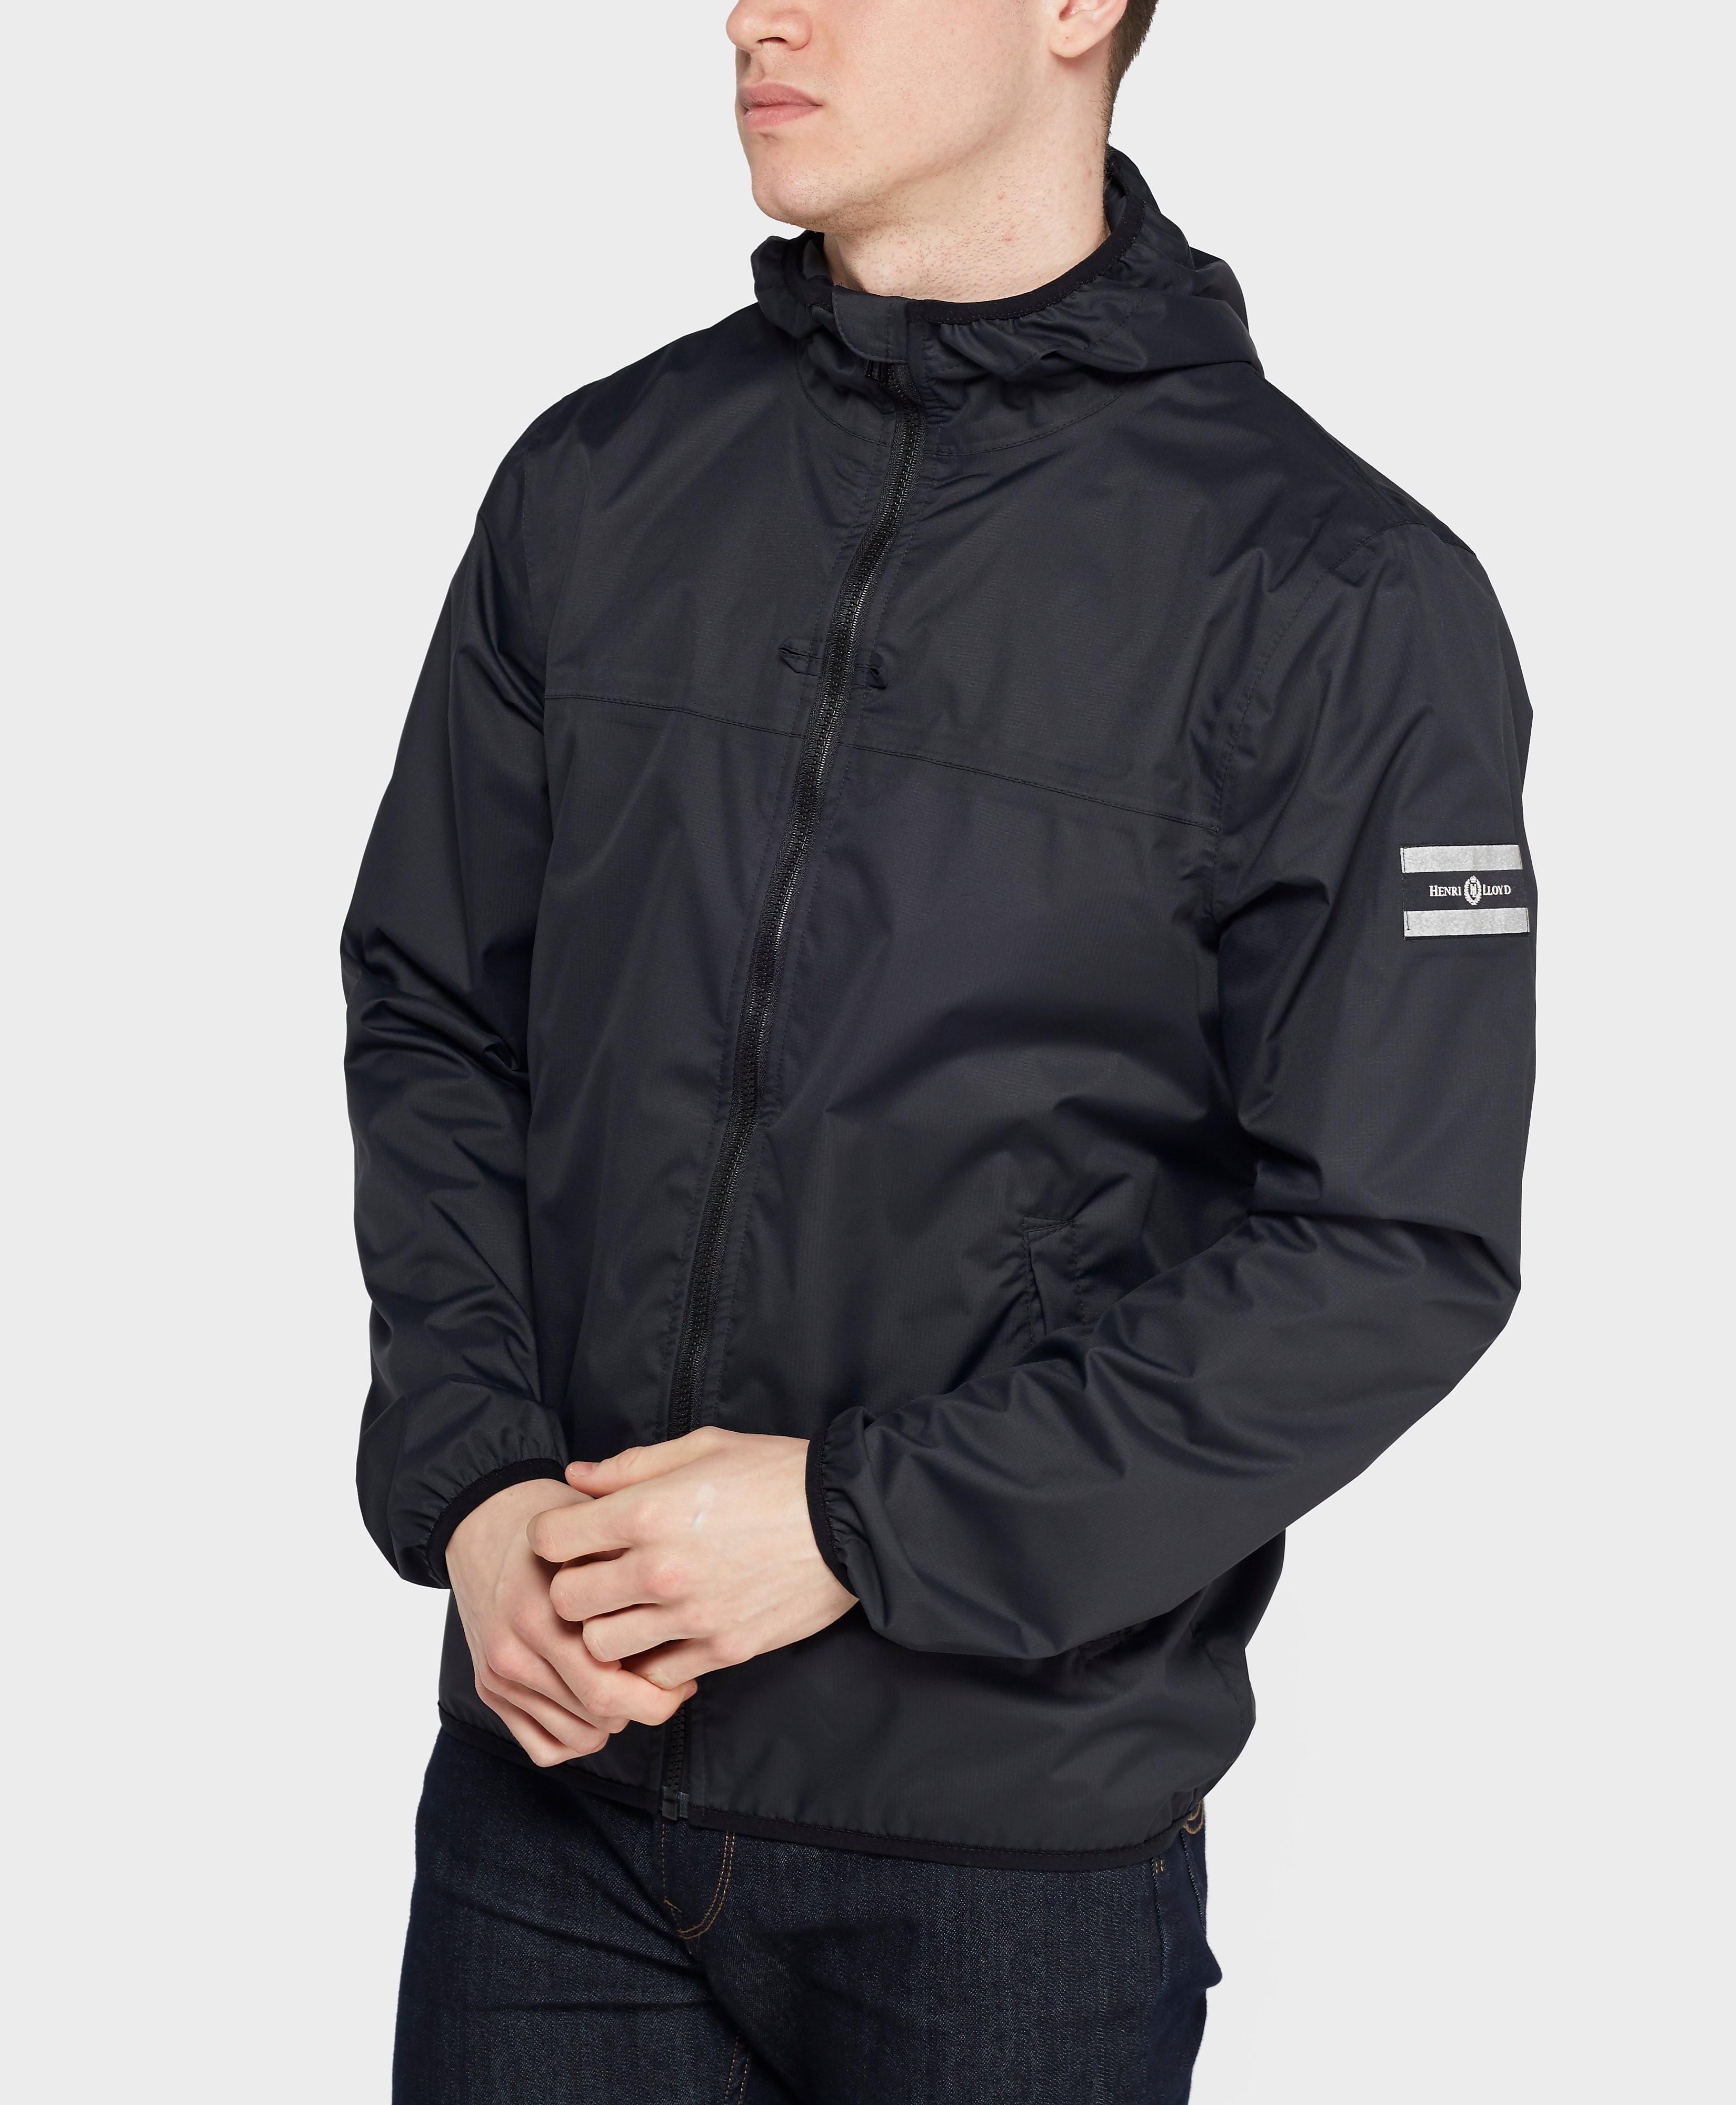 Henri Lloyd Satellite Lightweight Jacket  Black Black